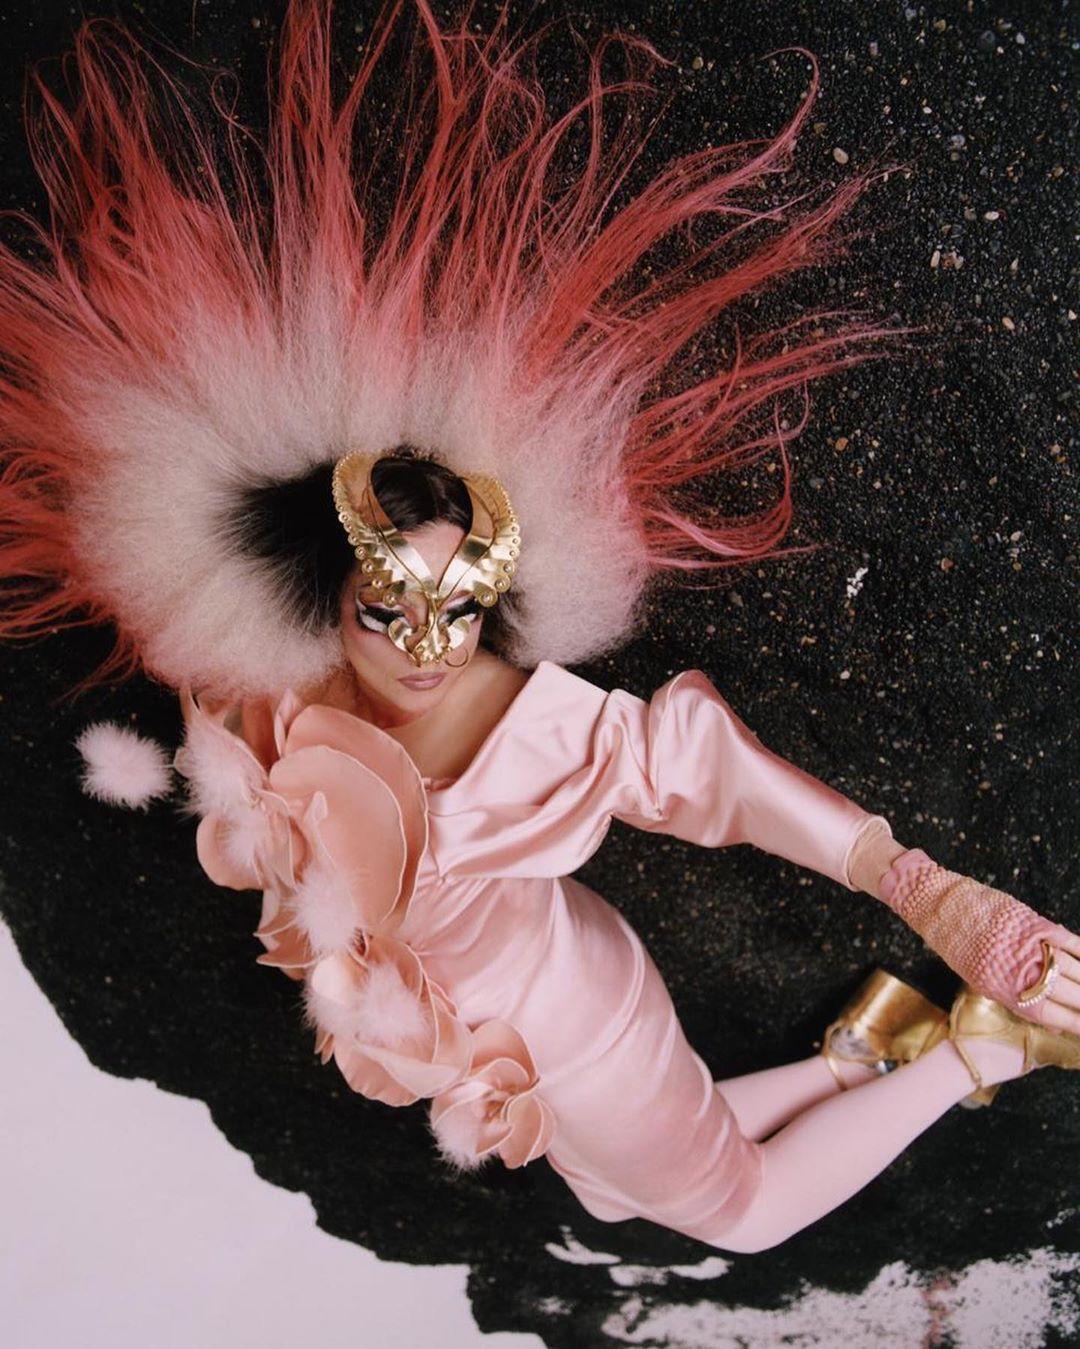 7 frases controversiales de Björk que son 100% Björk